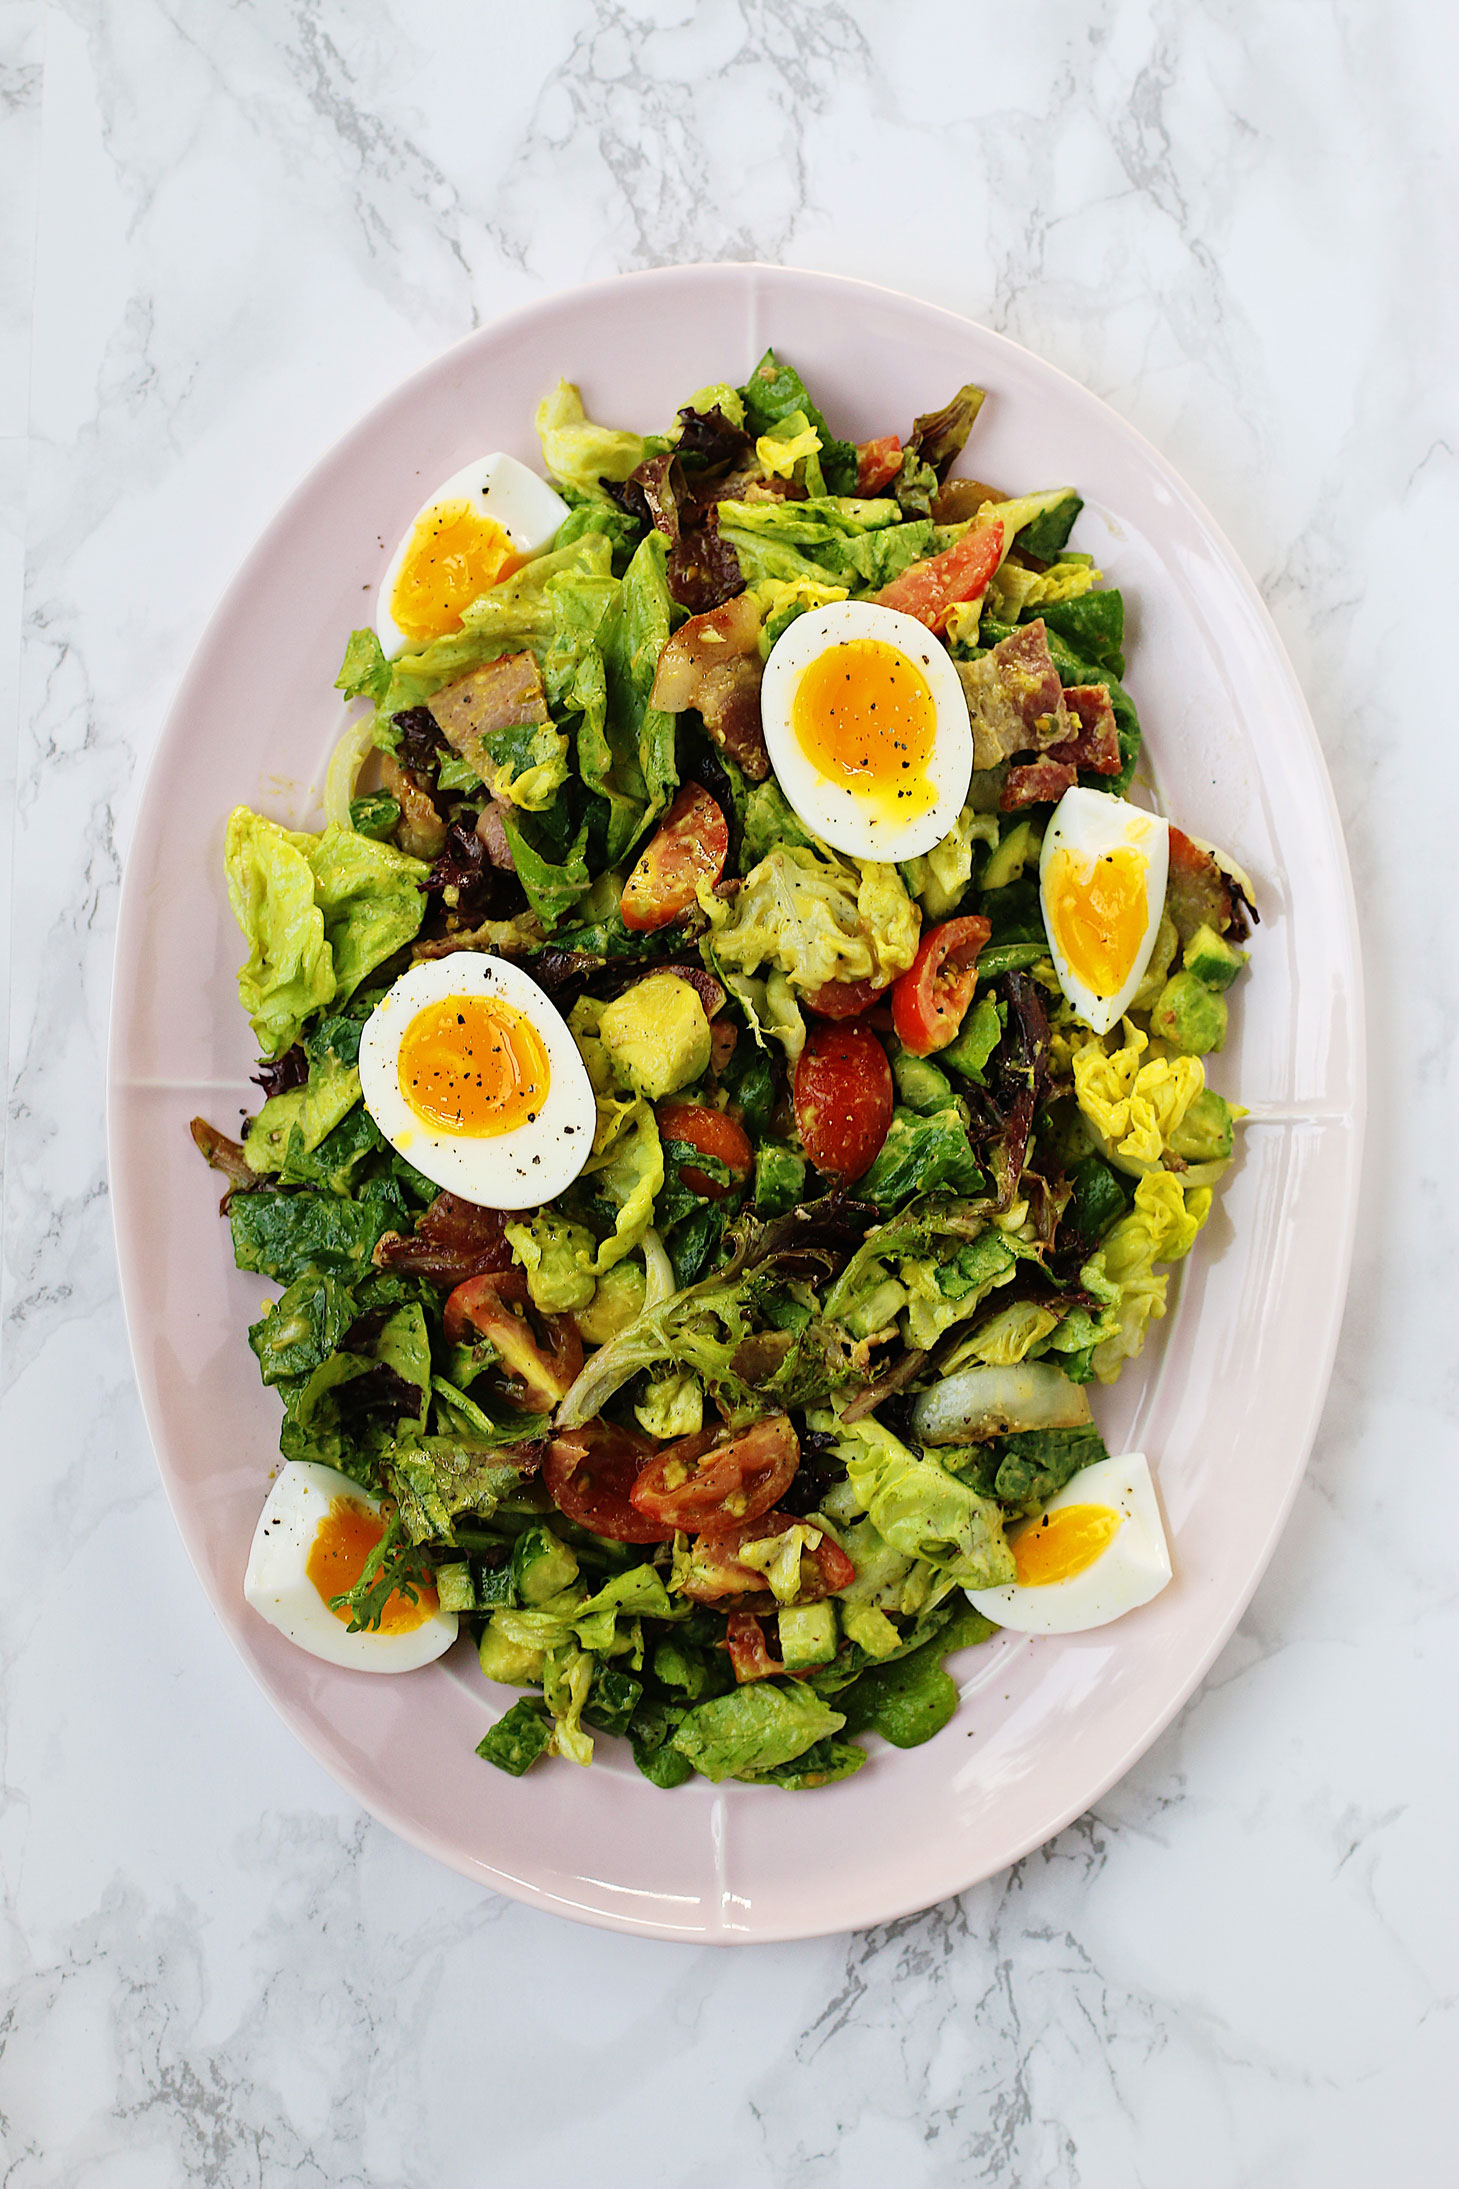 Her-Cookbook-Club-Molly-On-the-Range-token-salad